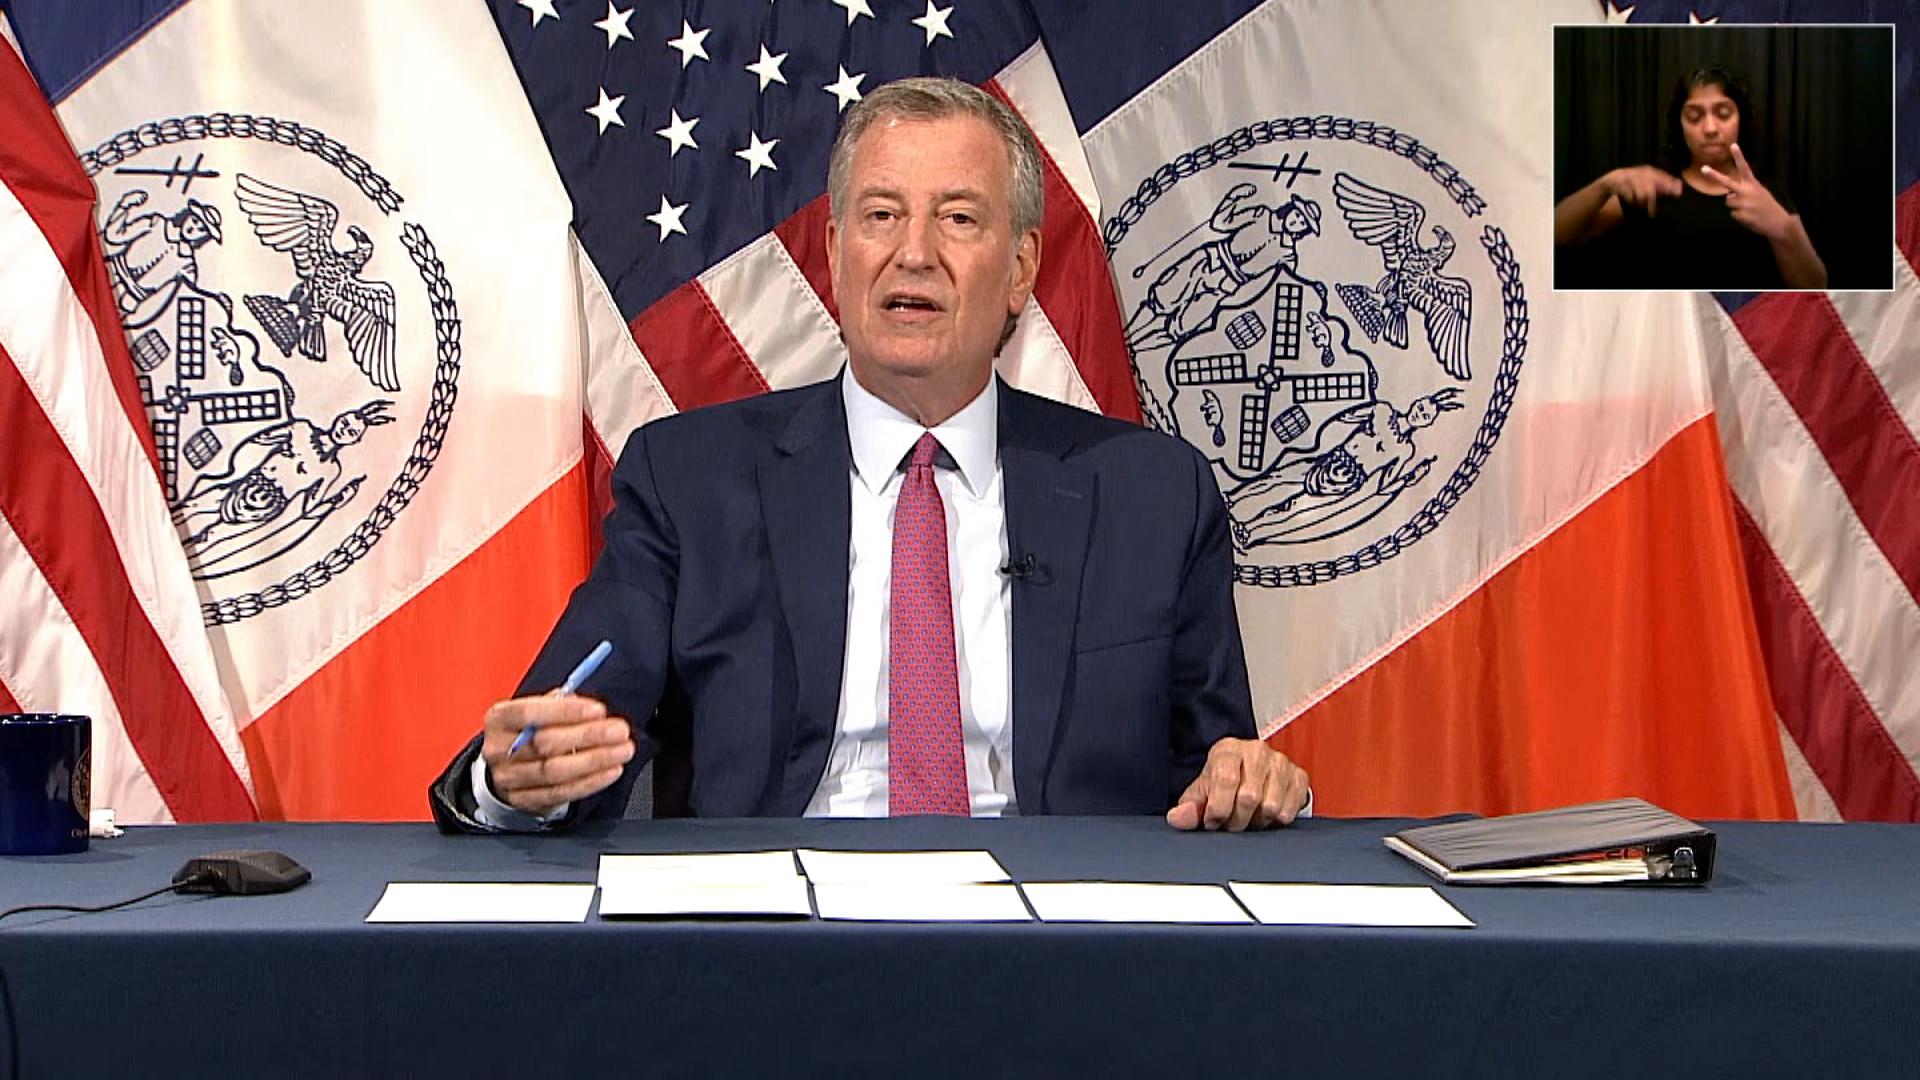 New York City Mayor Bill de Blasio speaks during a press briefing in New York on July 21.